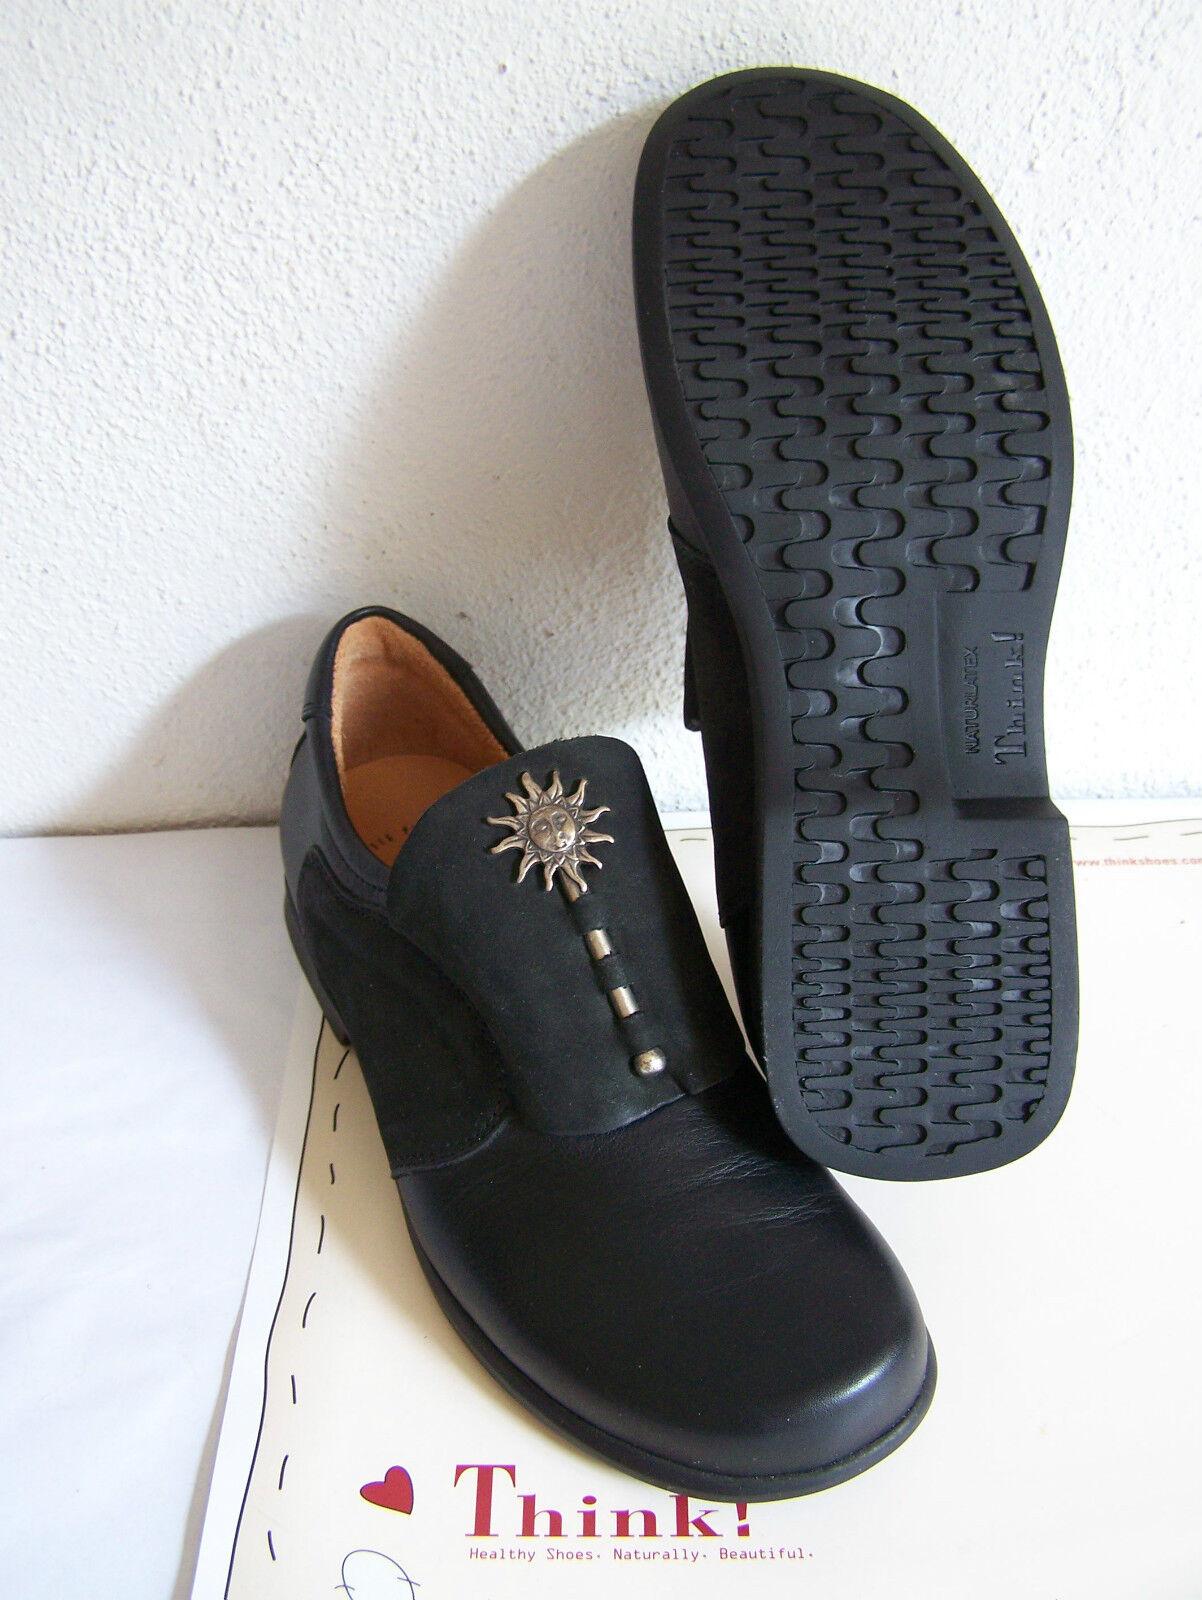 Think  Schuh Modell Pensa Mond schwarzer Slipper Sonne - Mond Pensa & Schuhbeutel f0f674